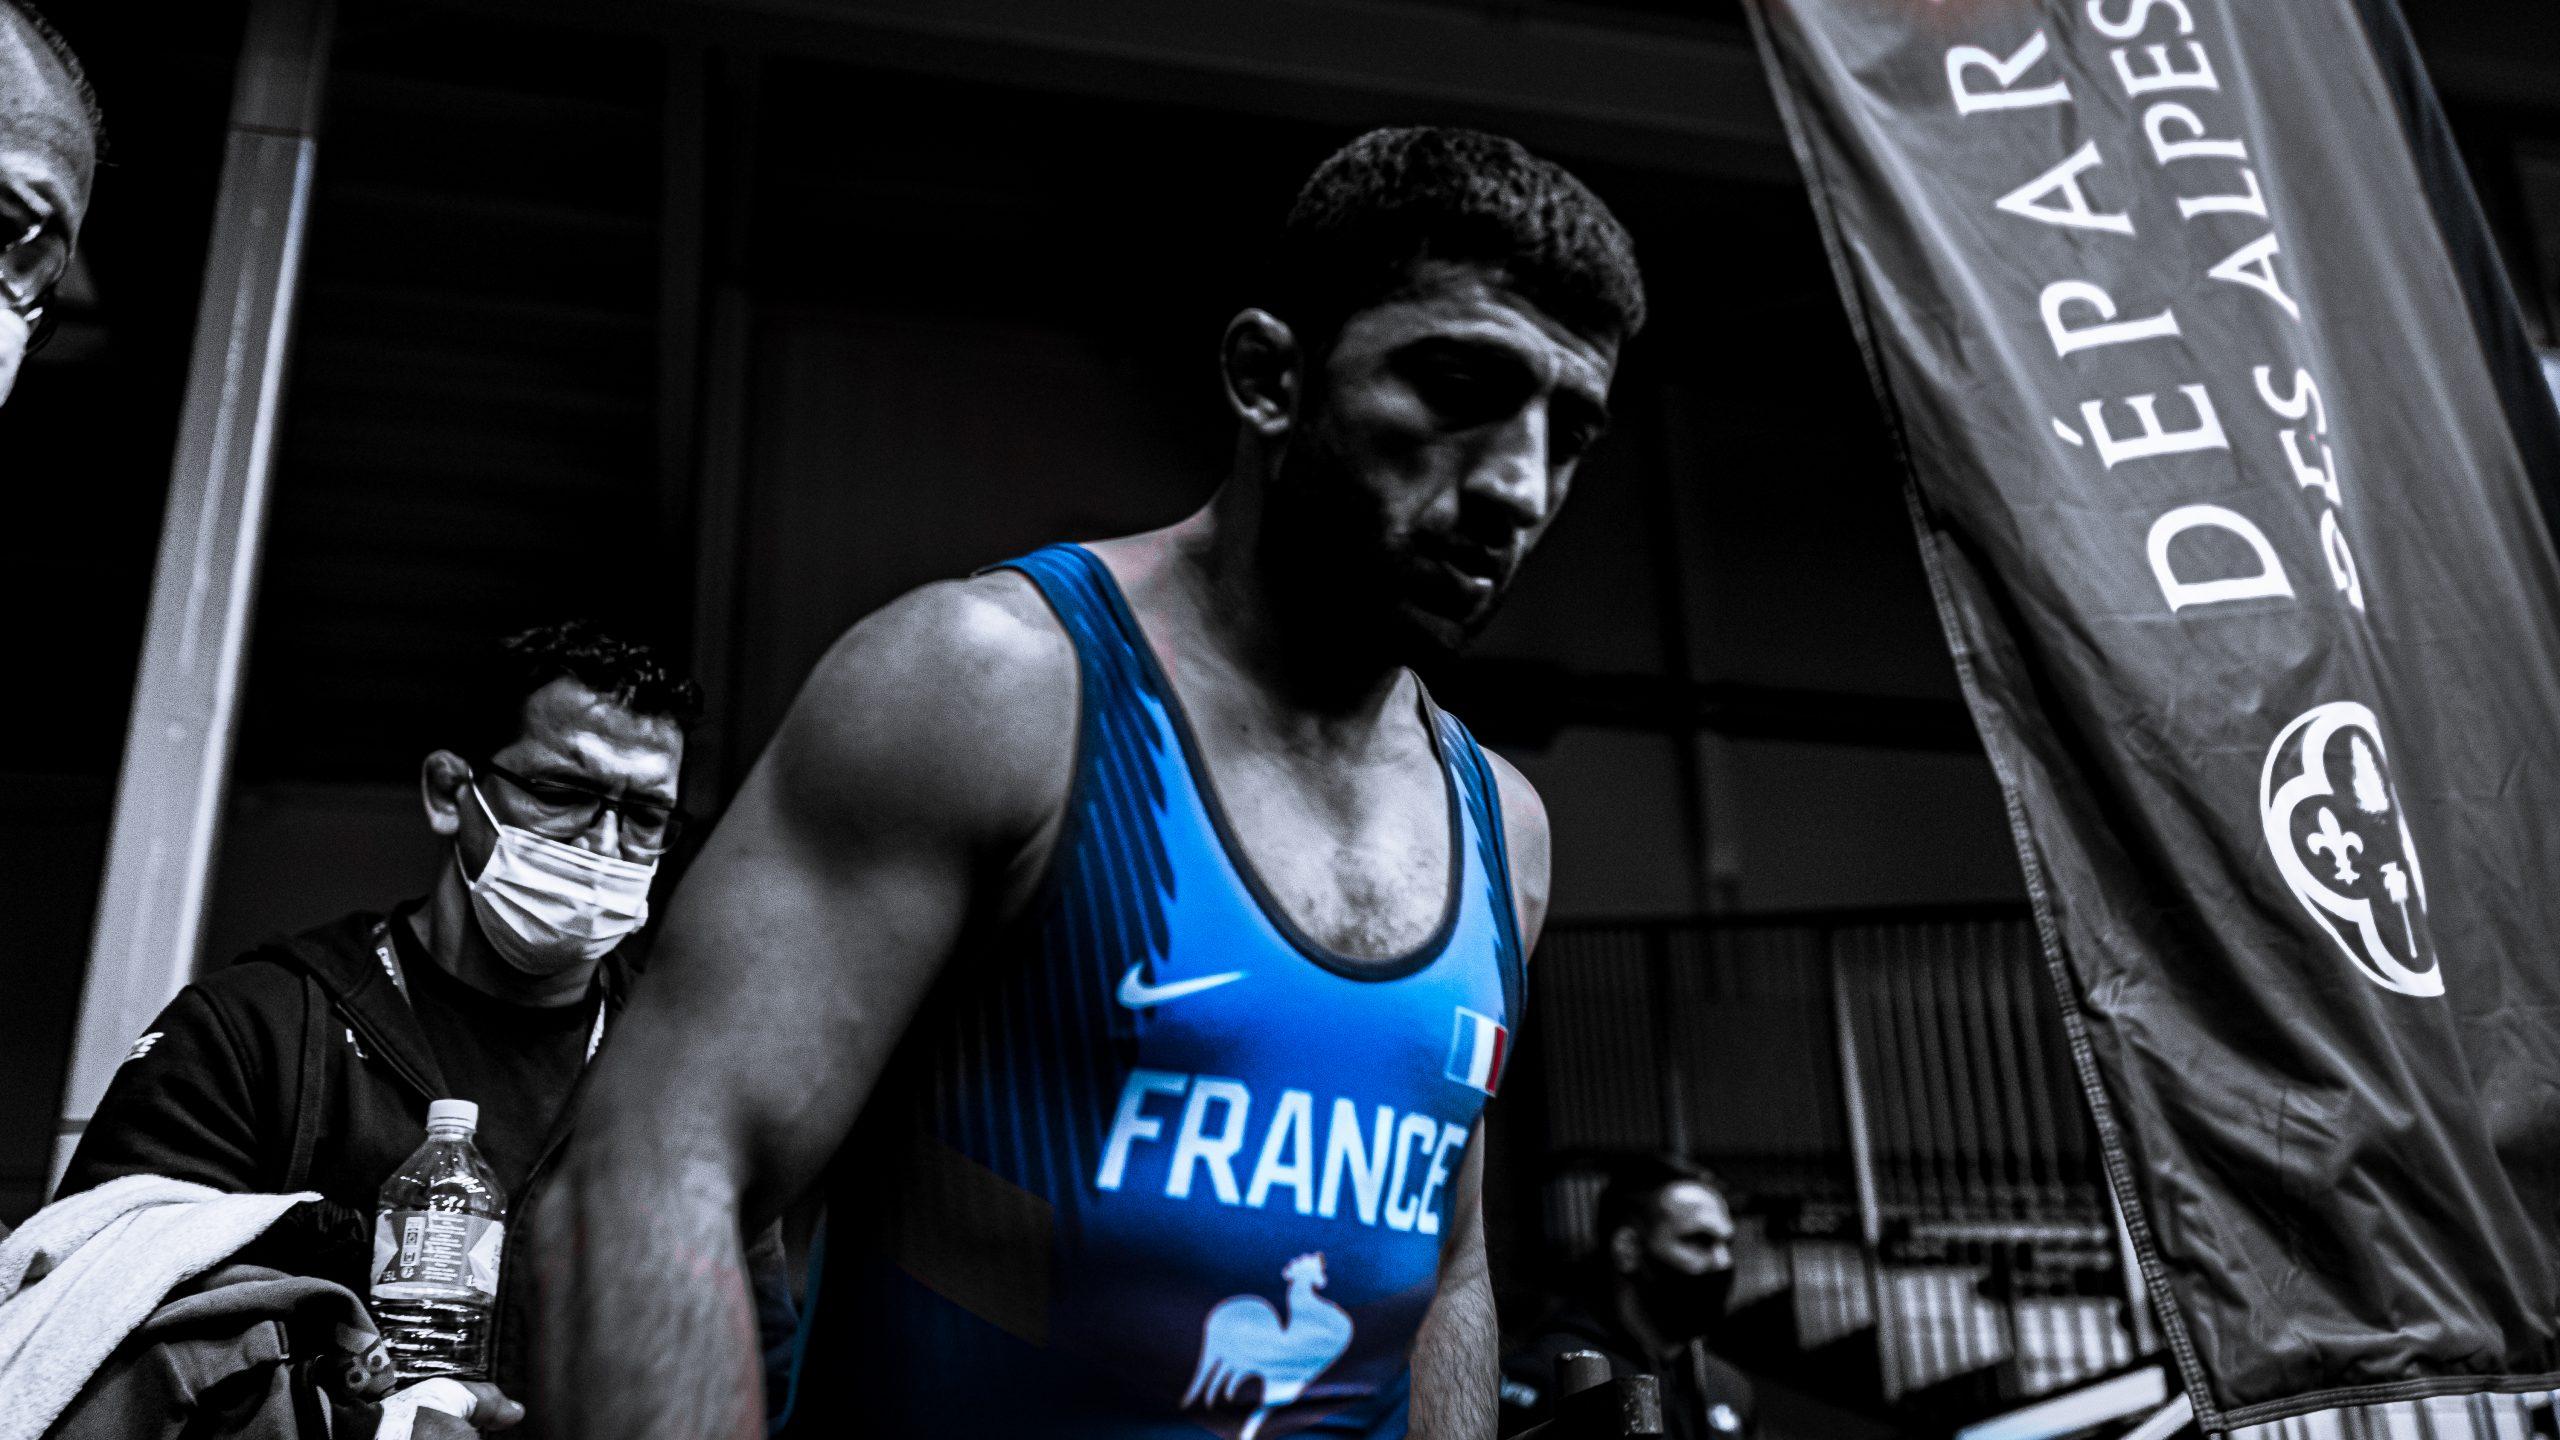 47 ème édition - Grand prix de France Henri Deglane : NIKOGHOSYAN Evrik